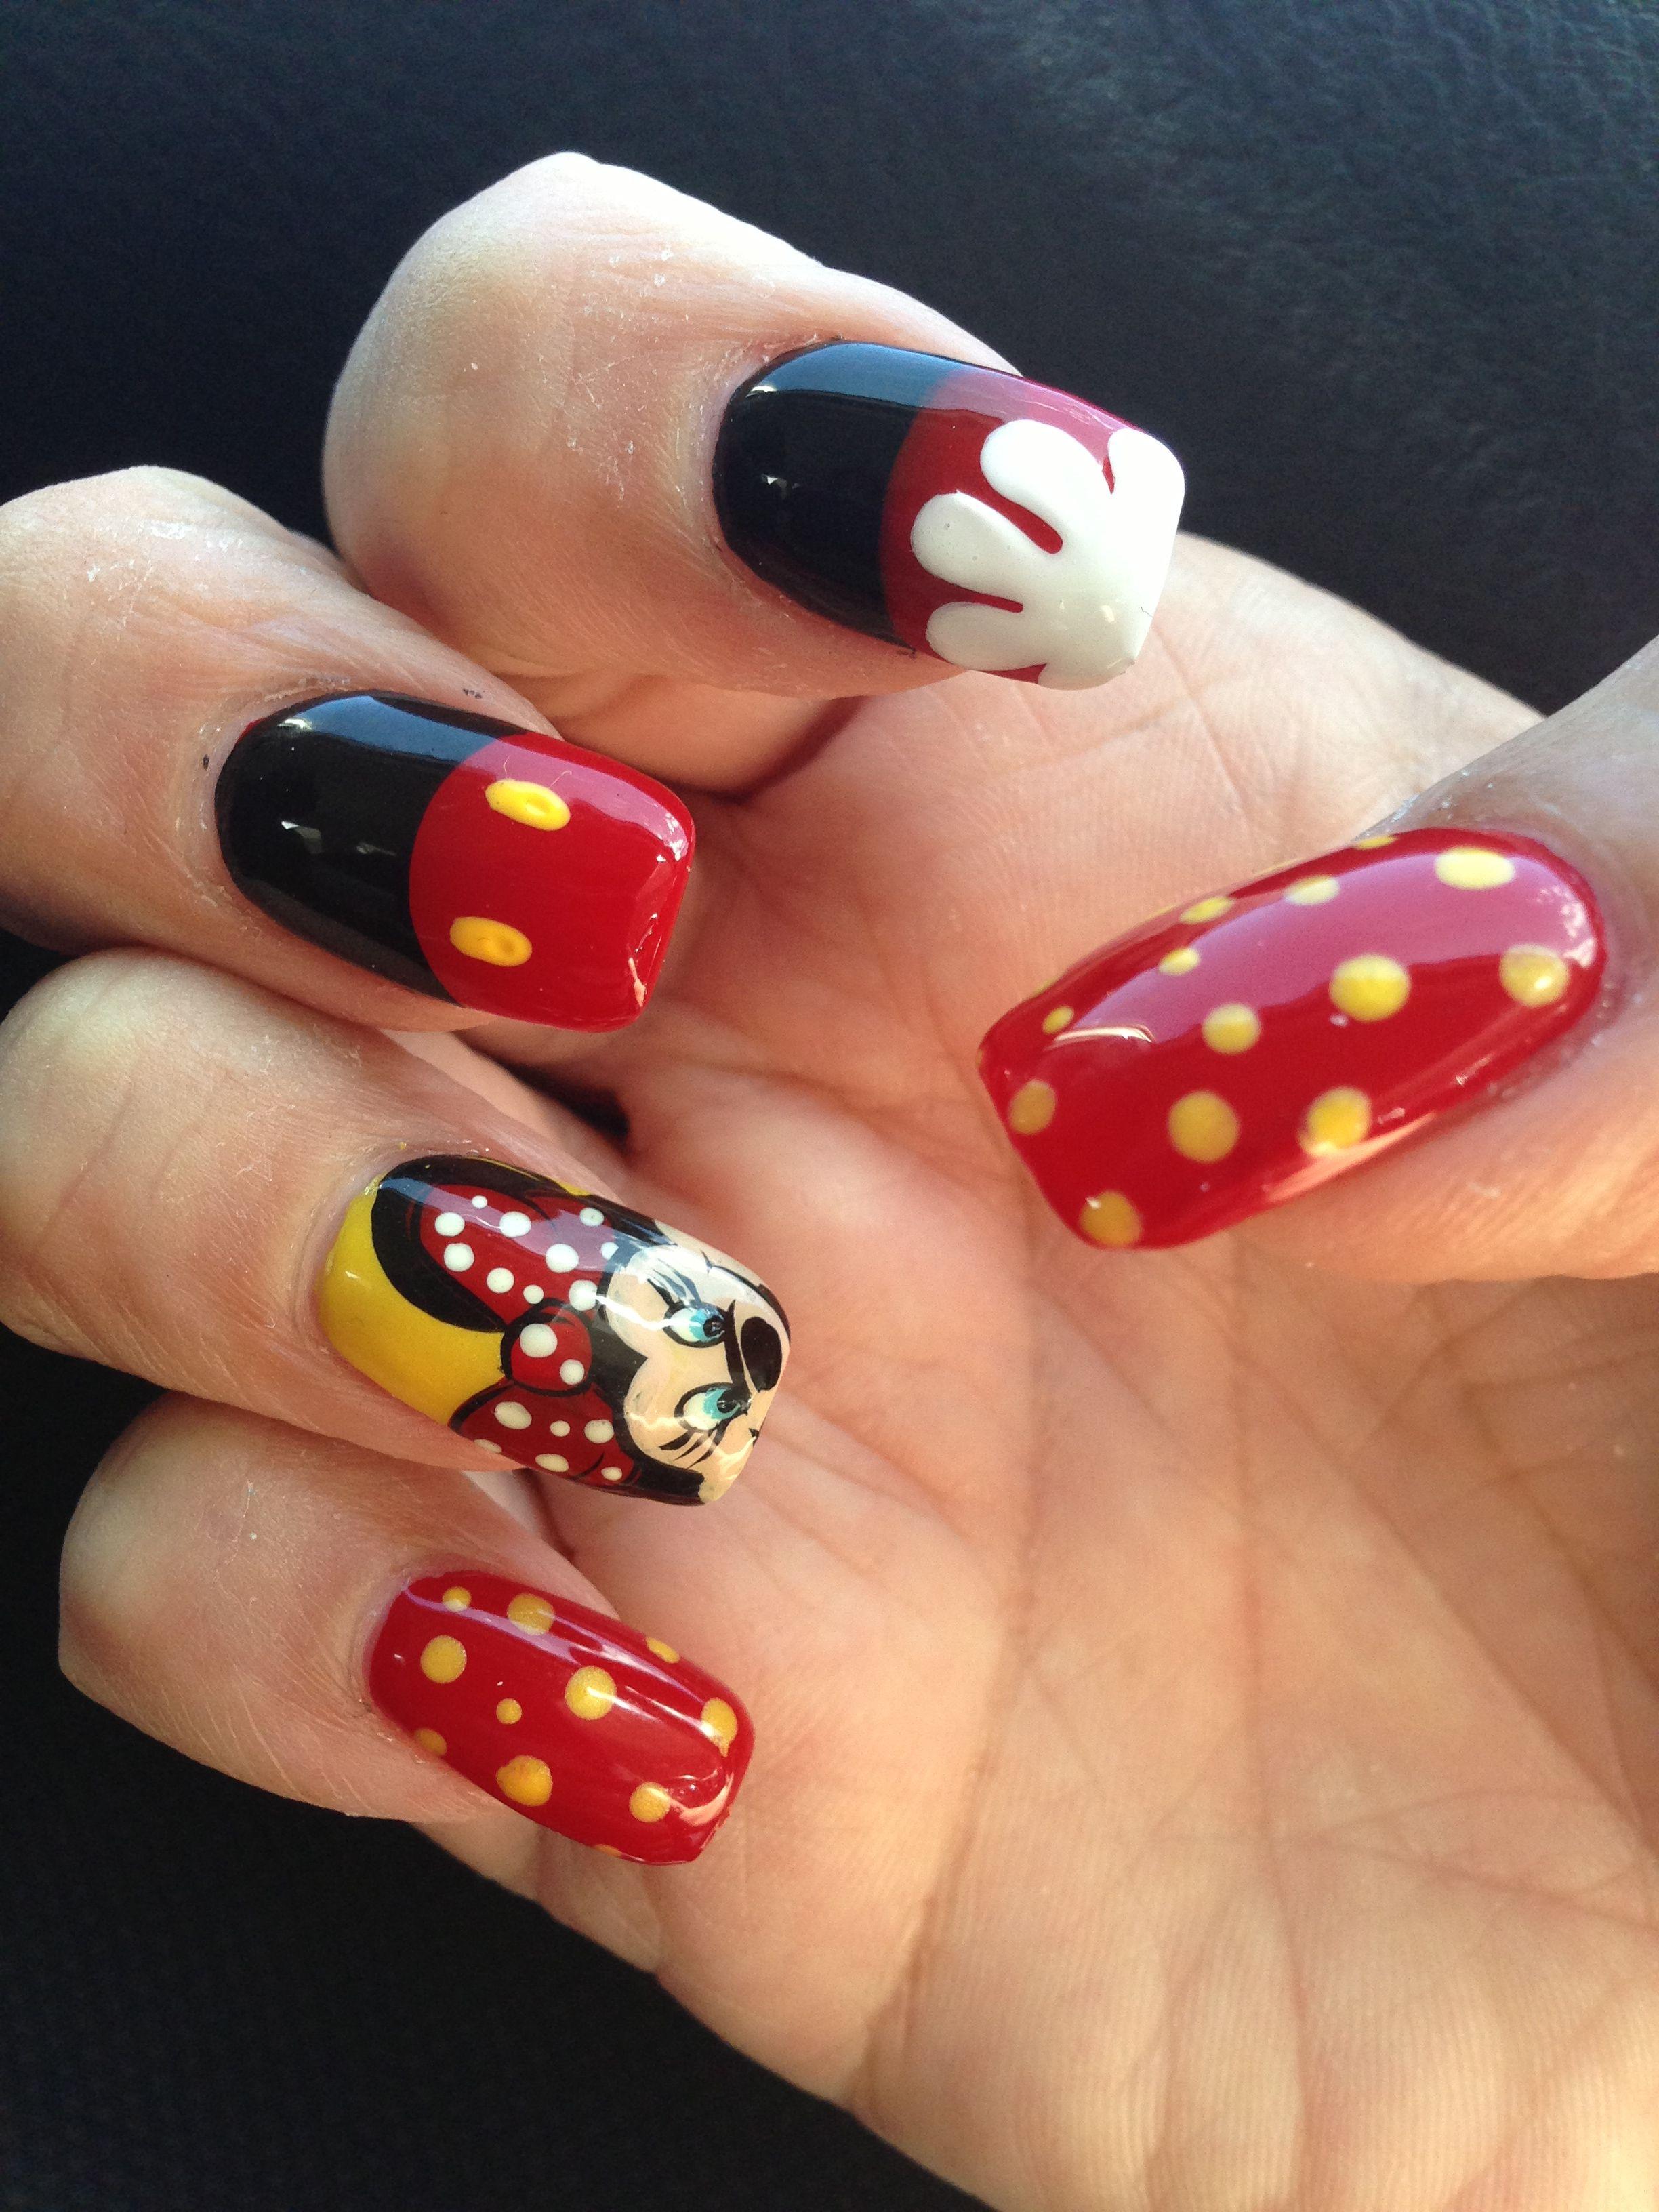 disney nail art. of red